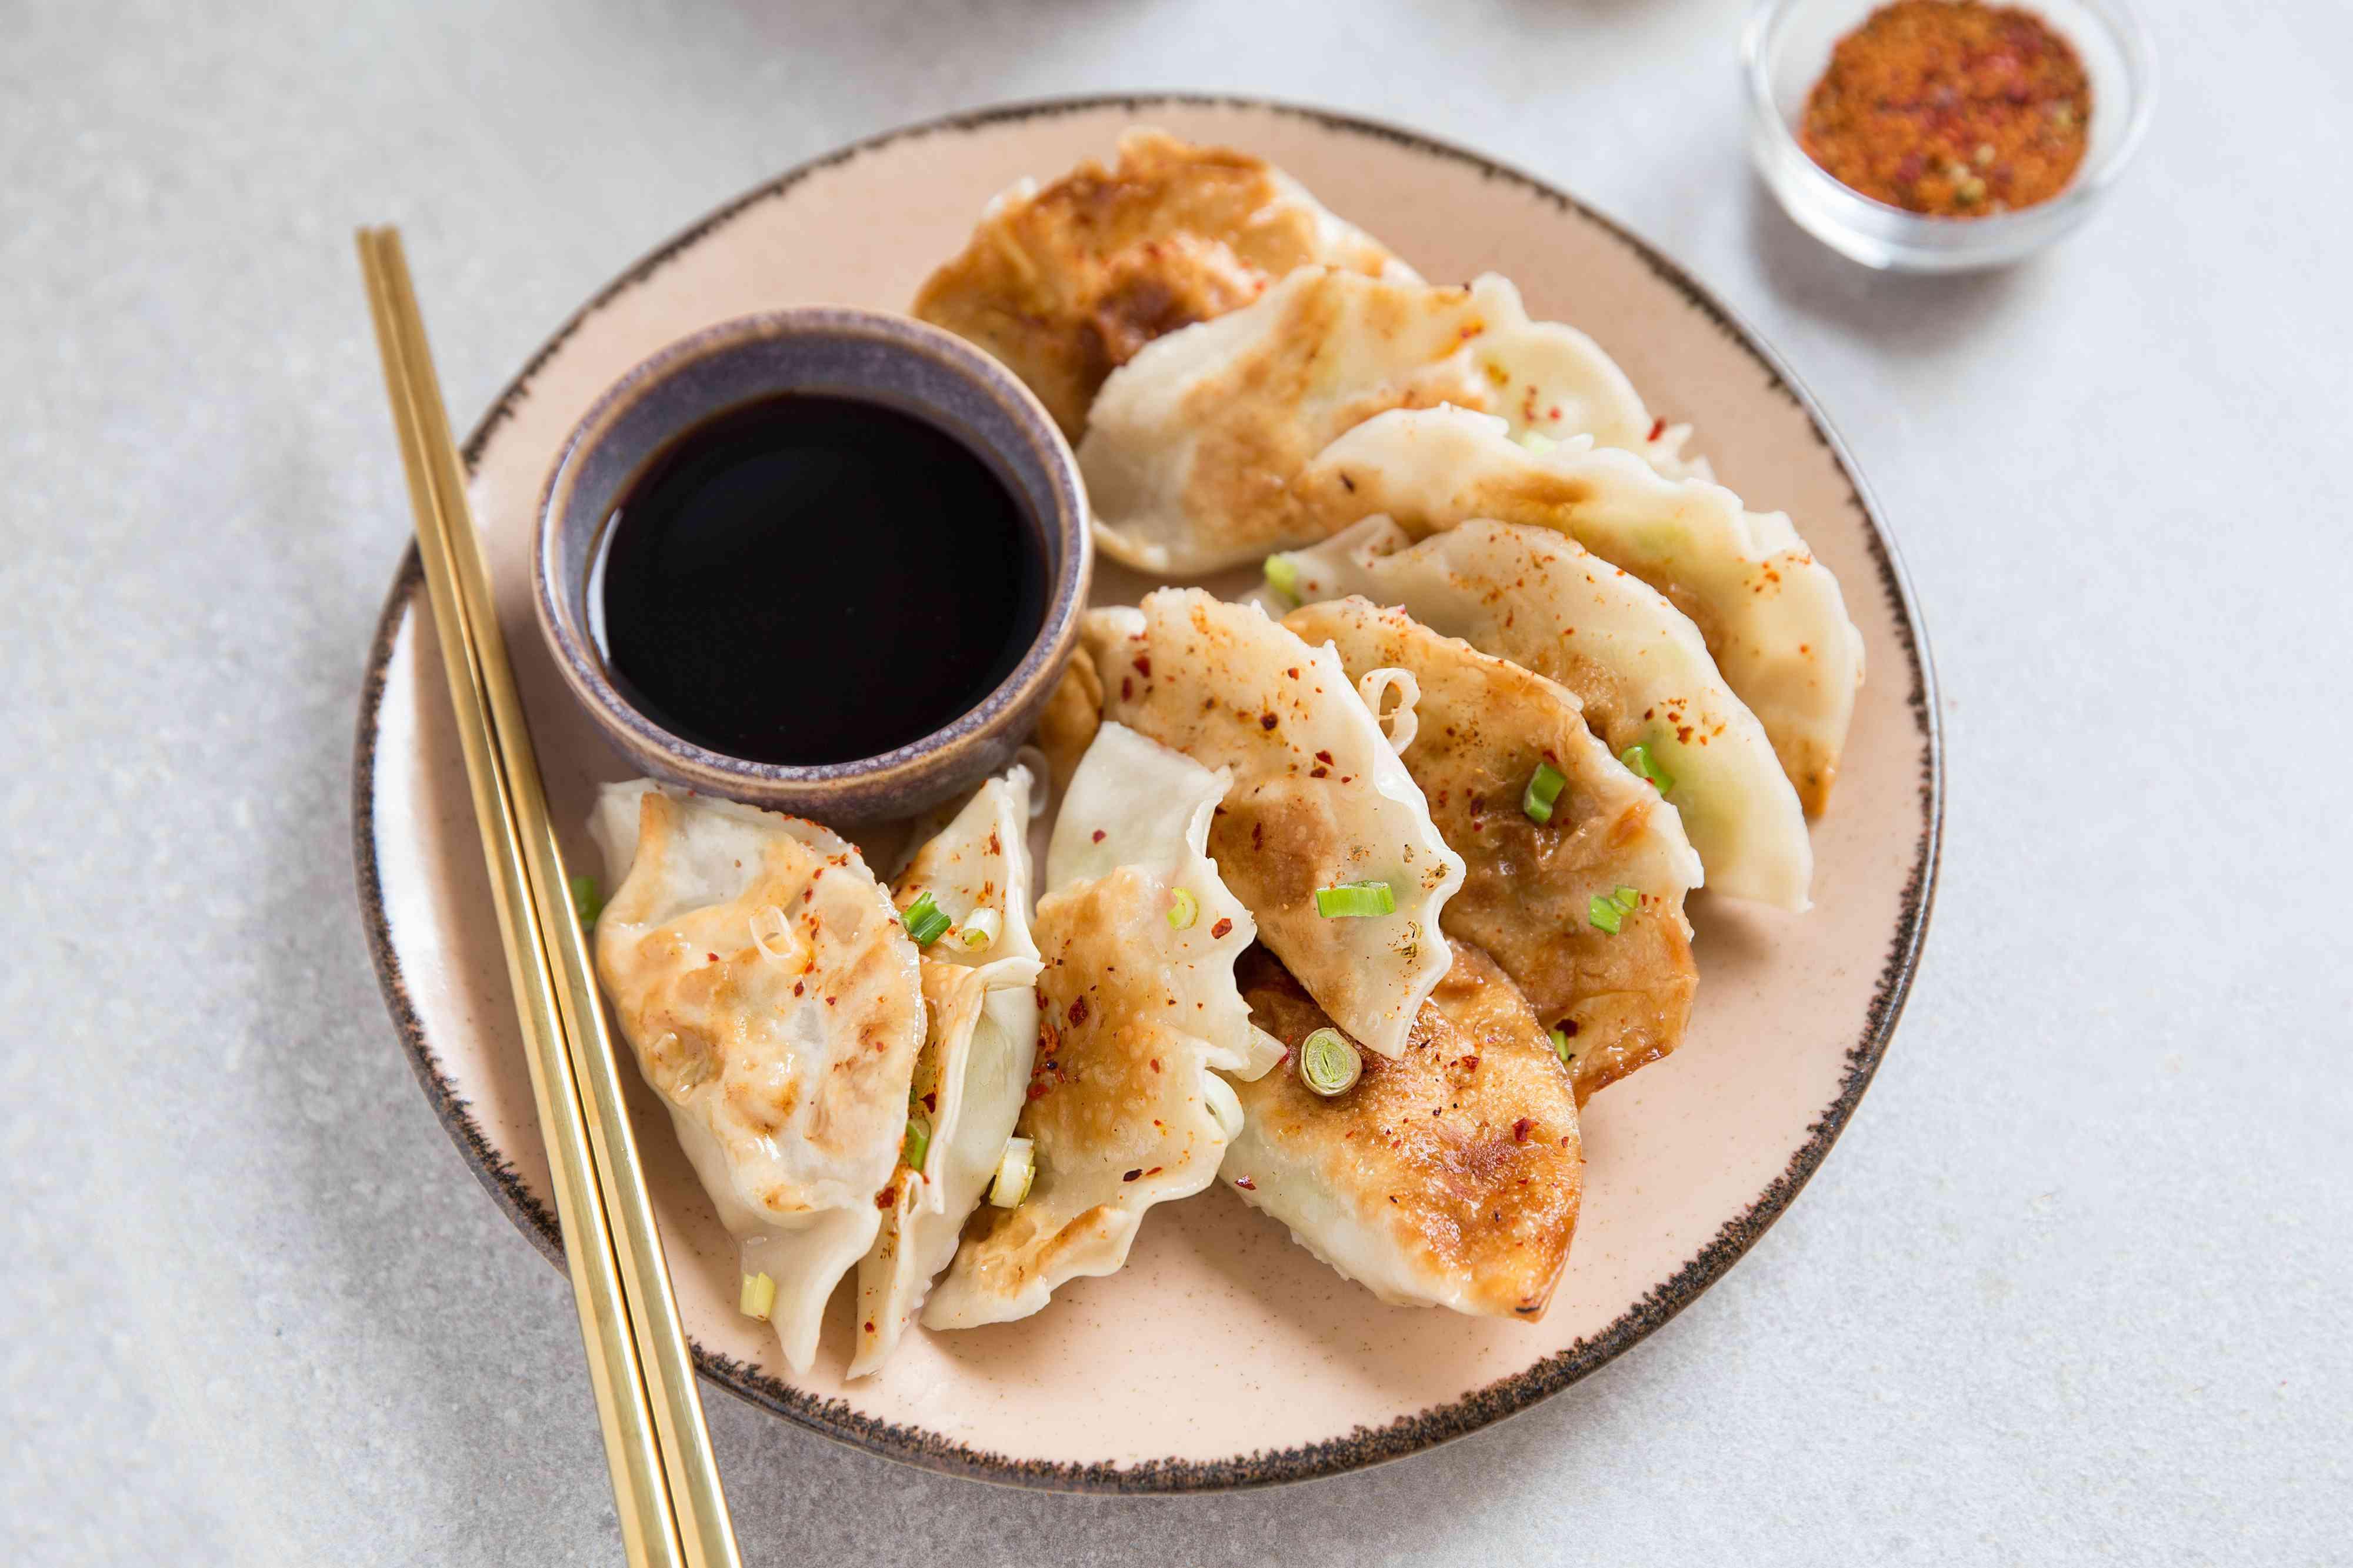 Japanese Shrimp Gyoza on a plate